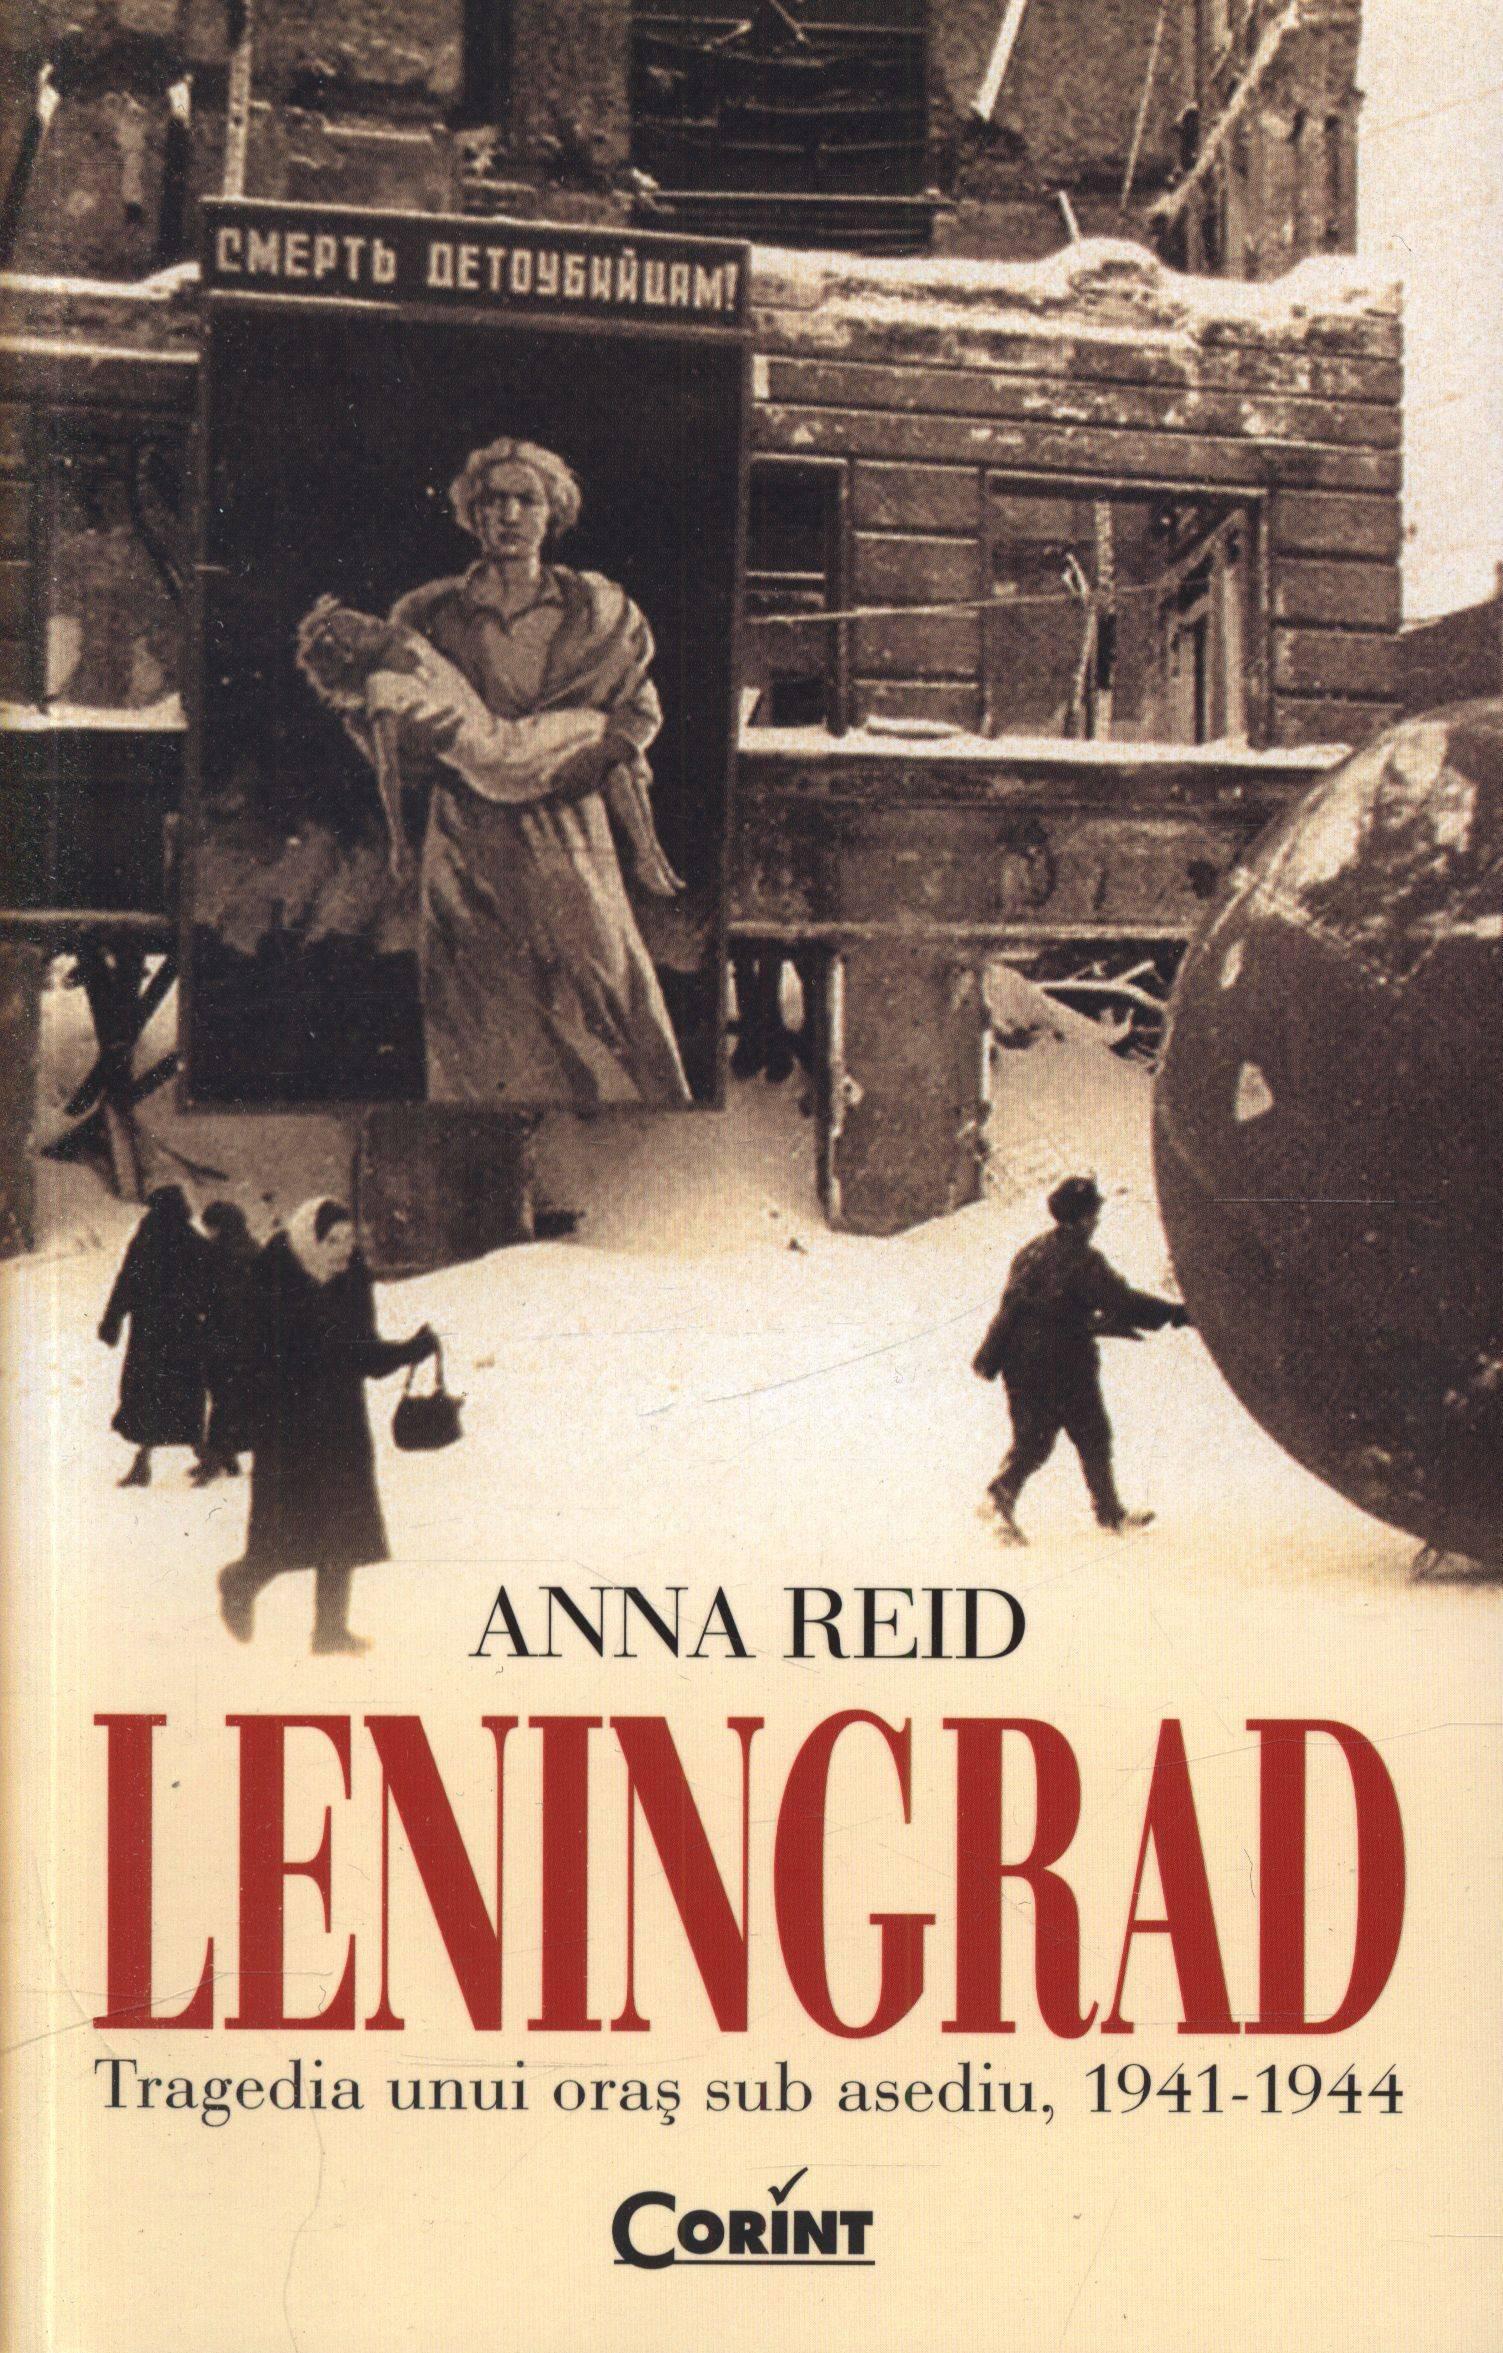 leningrad-tragedia-unui-oras-sub-asediu-1941-1944_1_fullsize